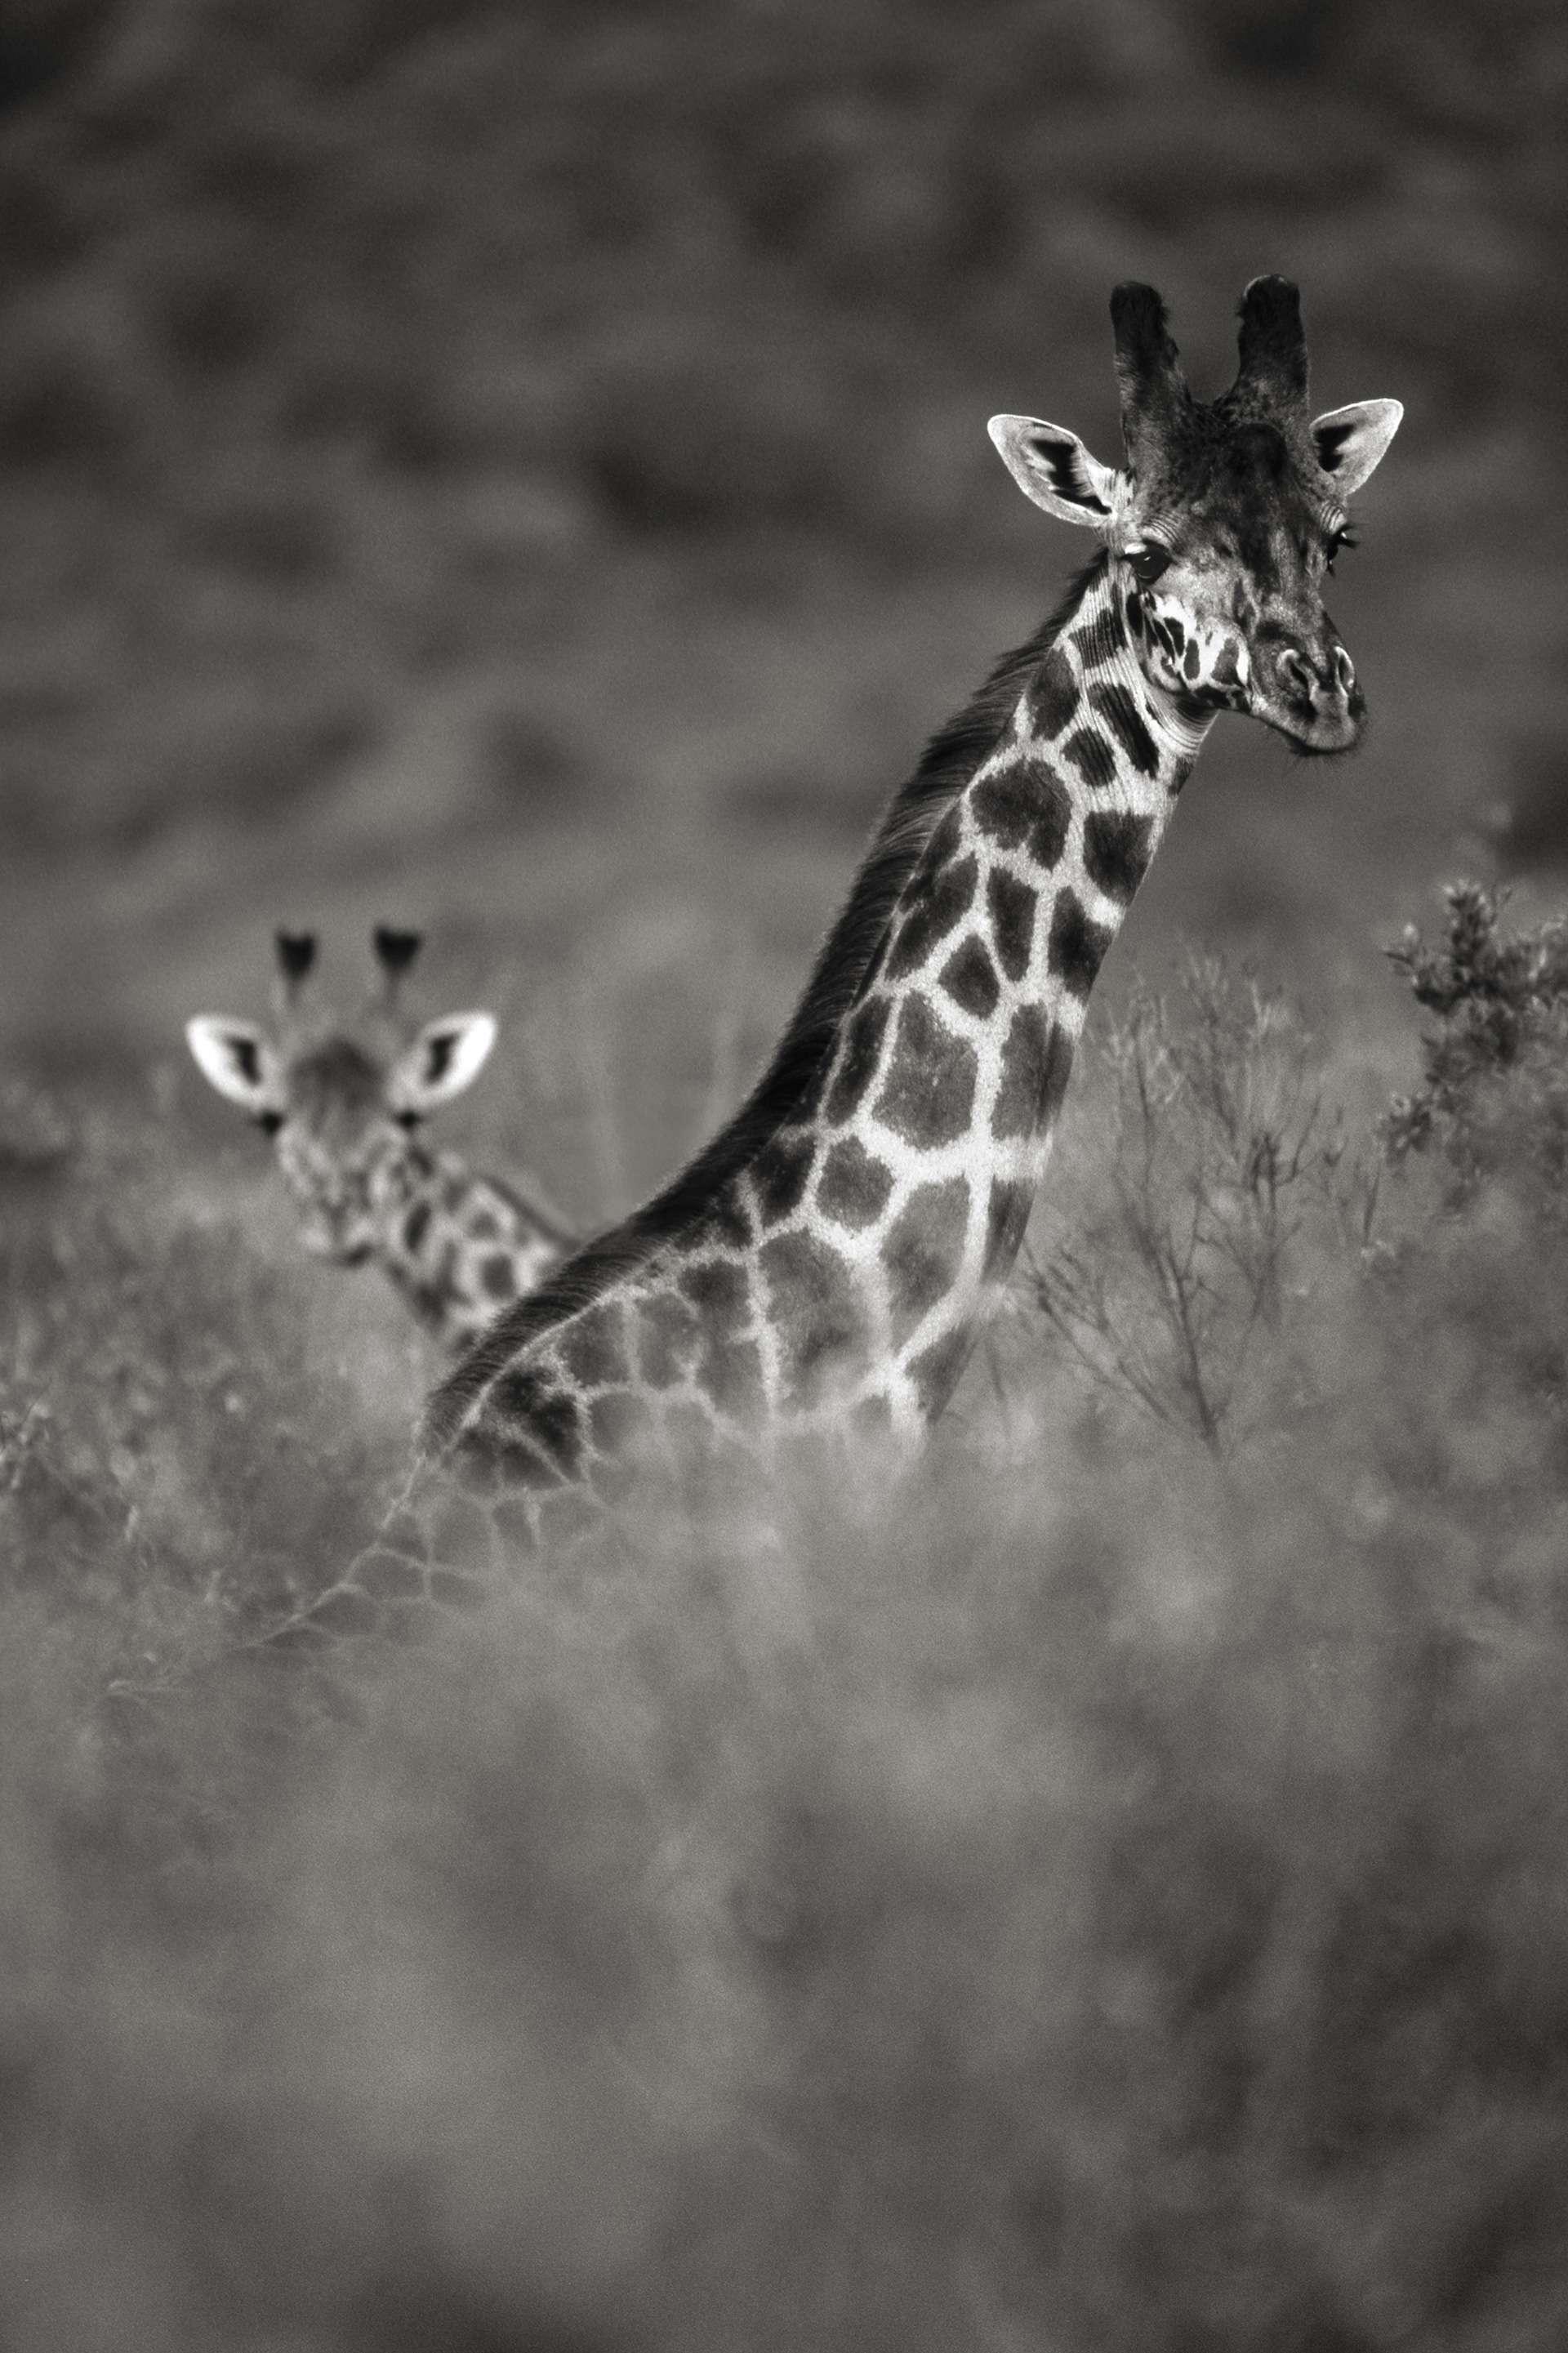 Photographie de Gilles Martin : girafe du Kenya, Struggle for life